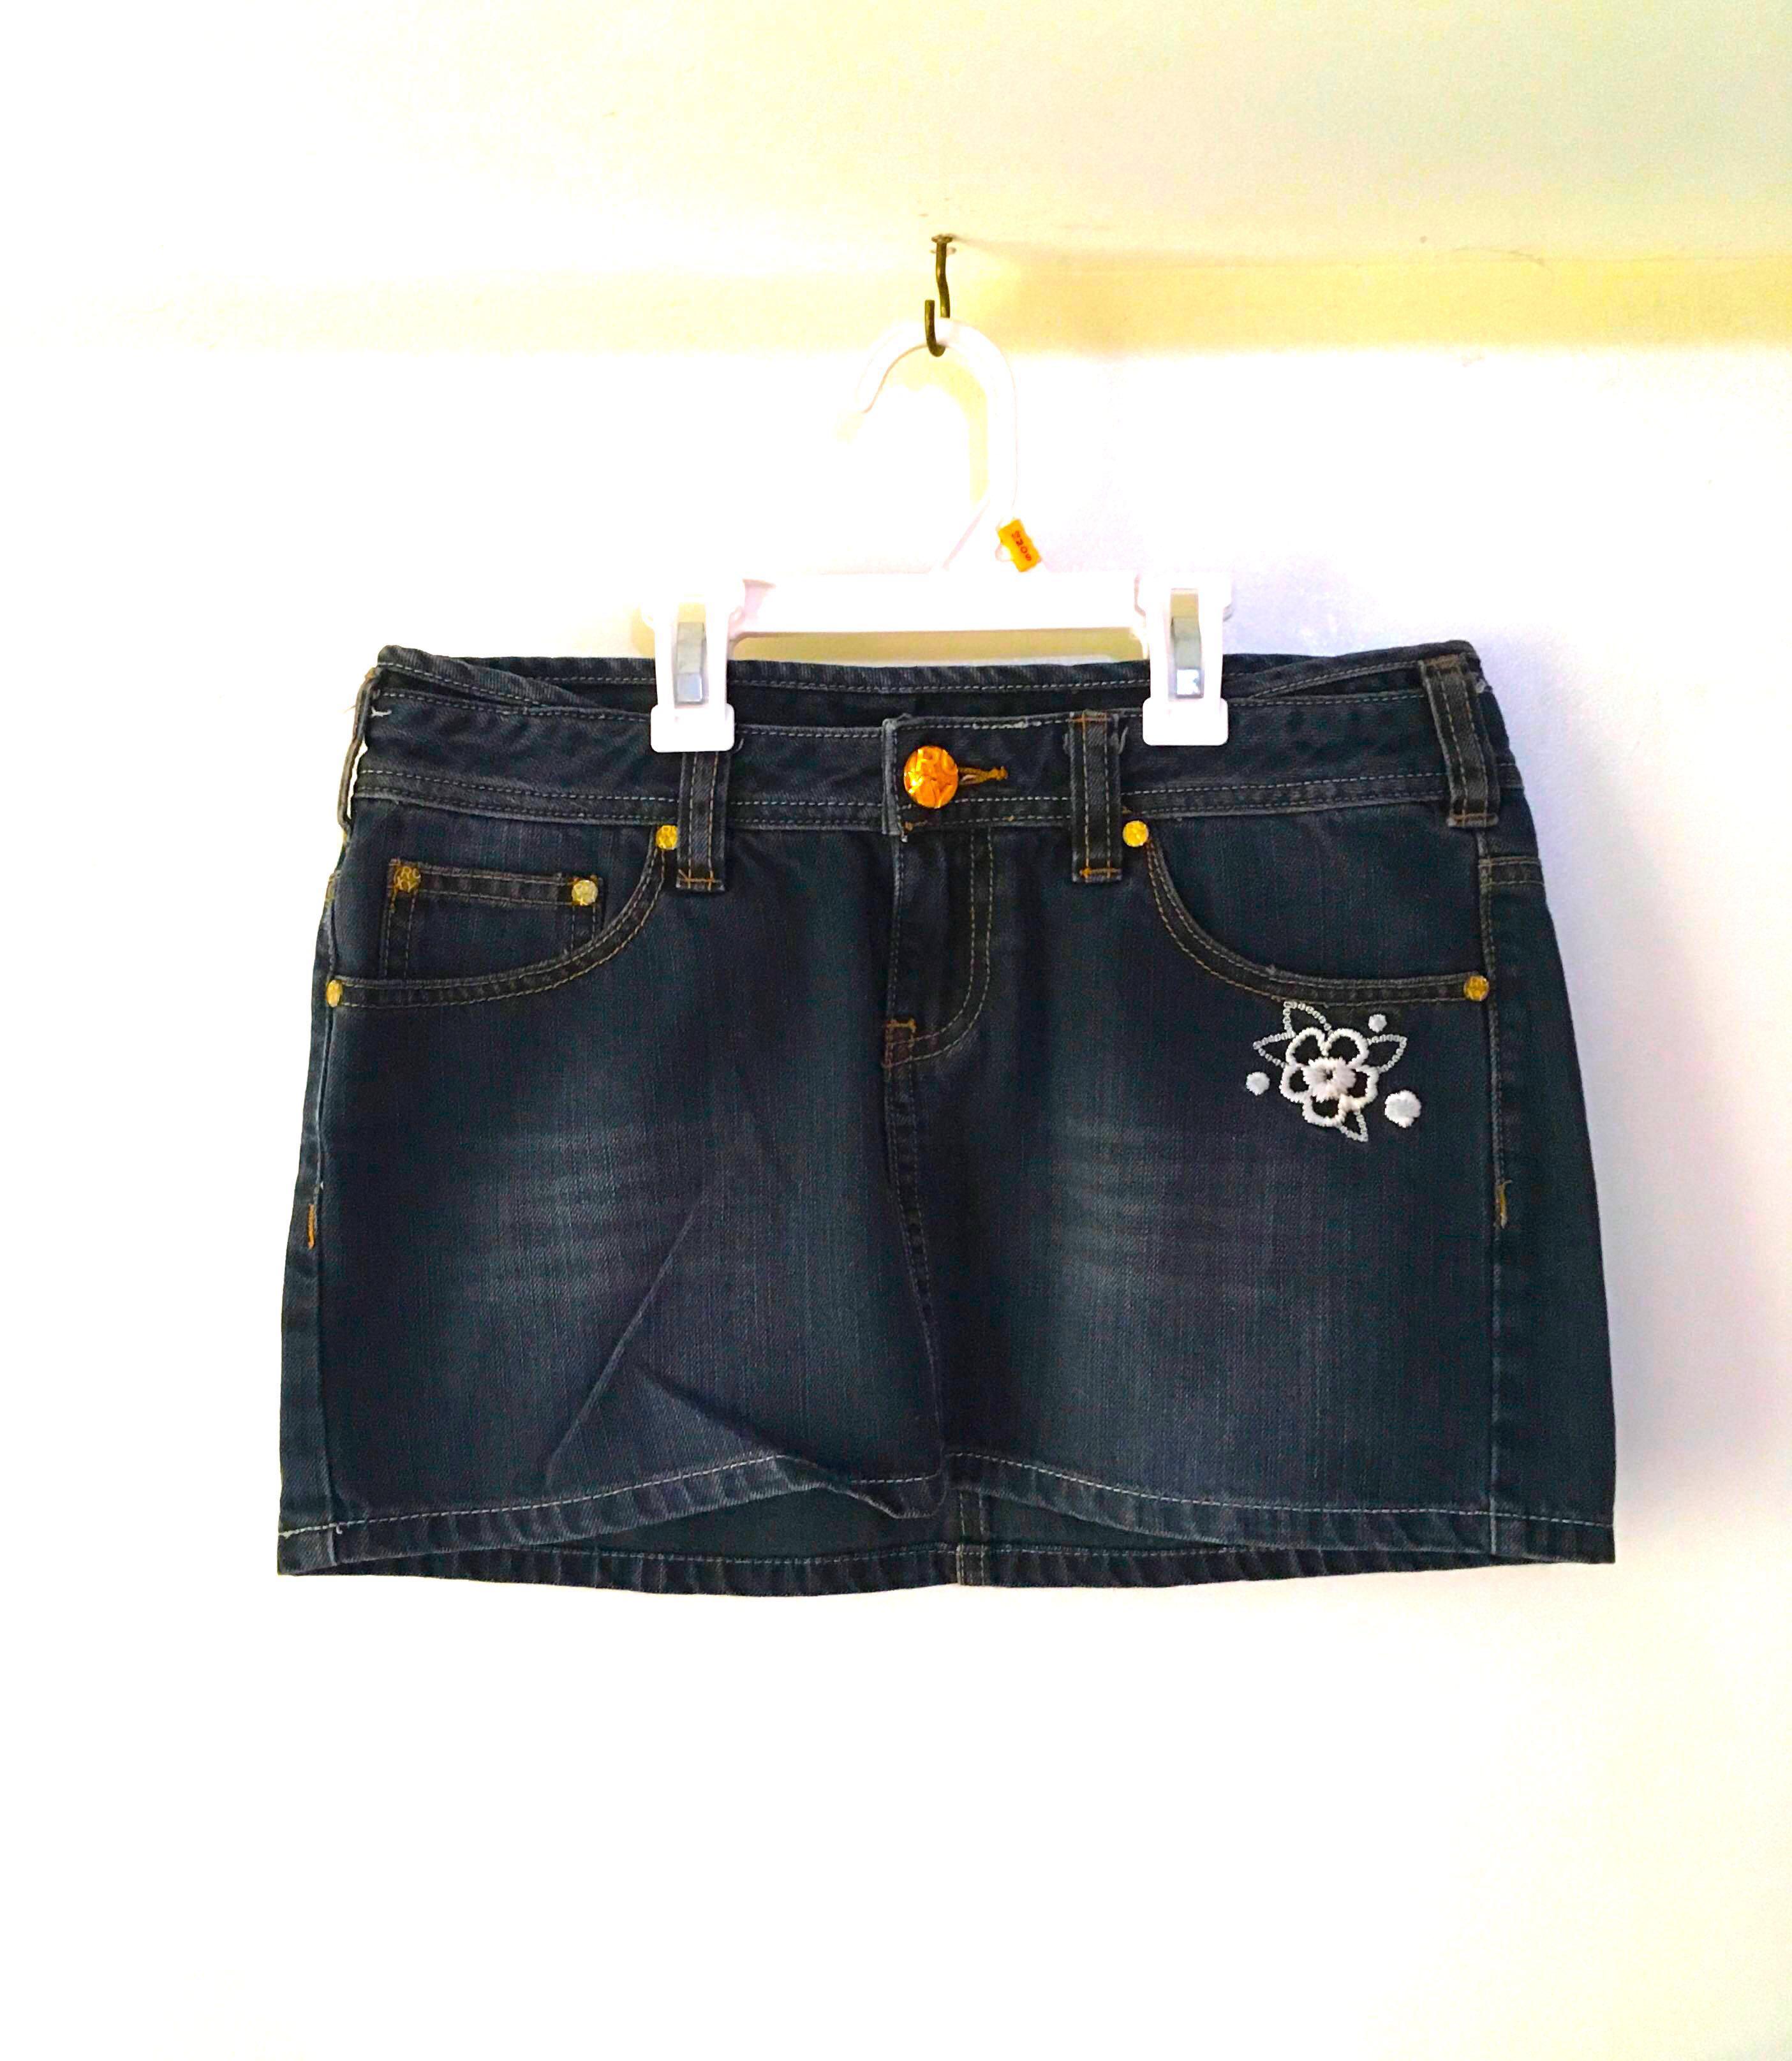 Charity Sale! Authentic Roxy Denim Mini Skirt Size 3 Women